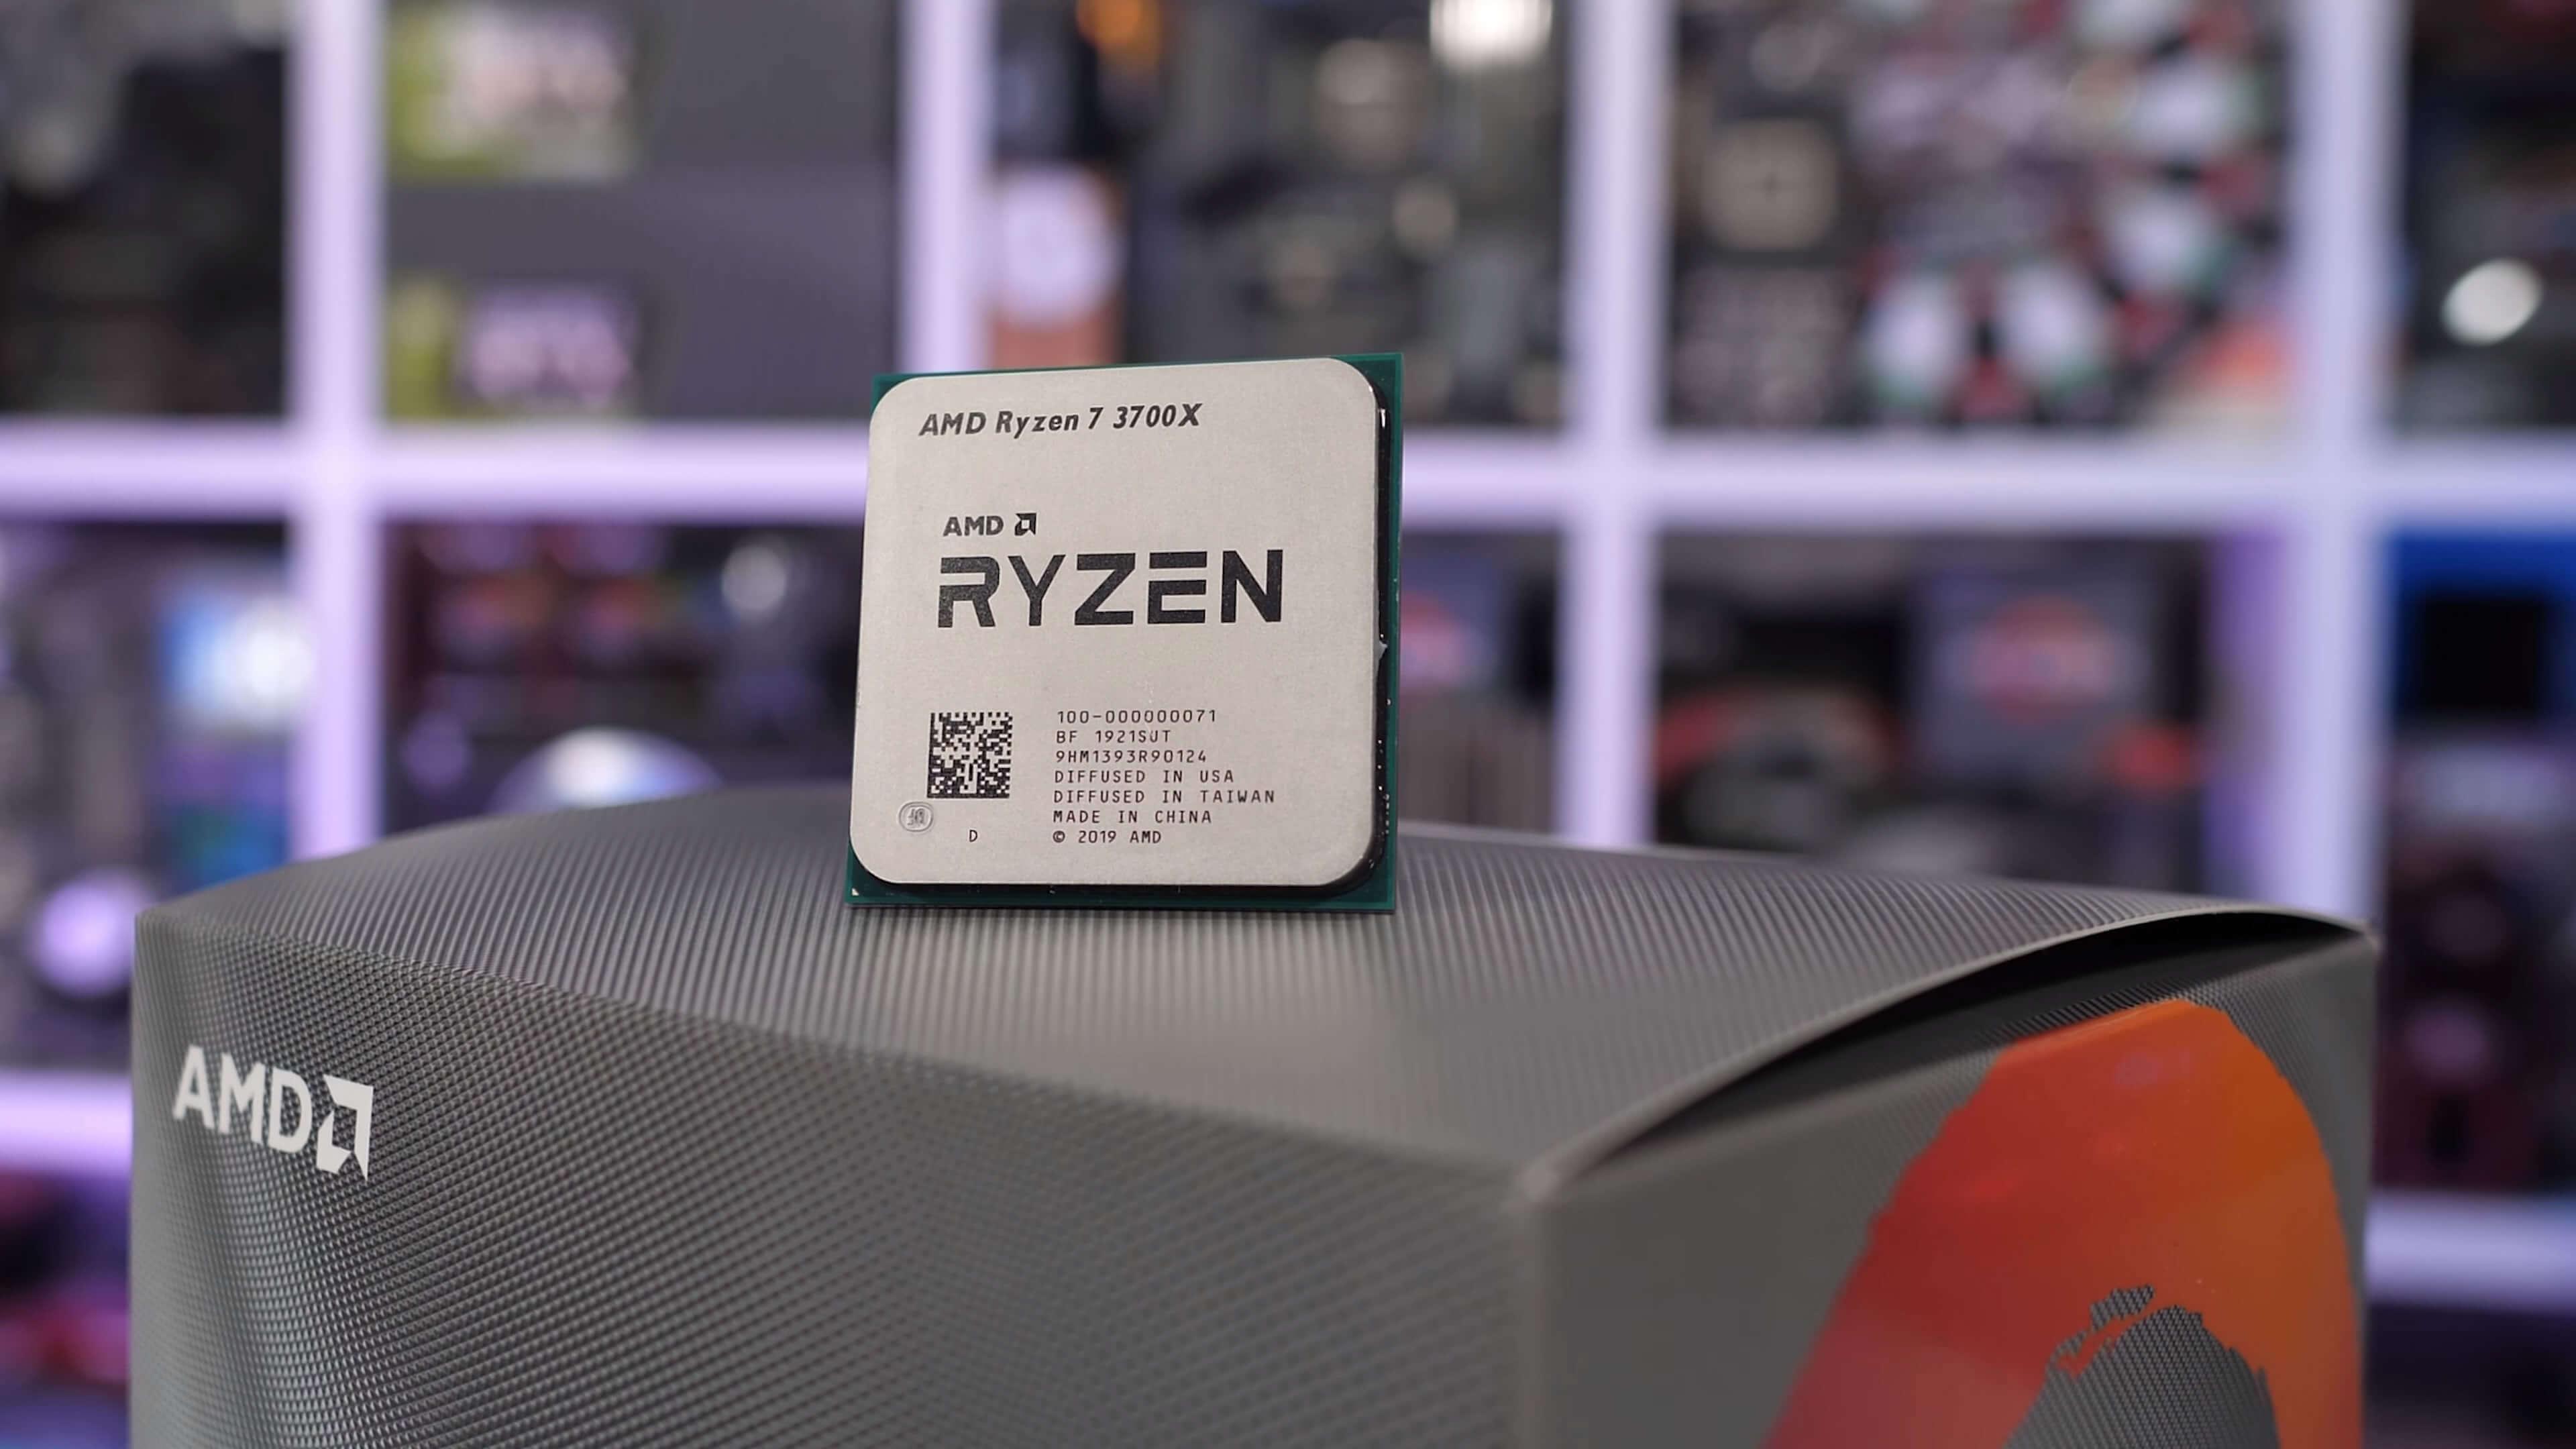 Ryzen 7 2700x Vs Ryzen 7 3700x High Refresh Gaming Comparison